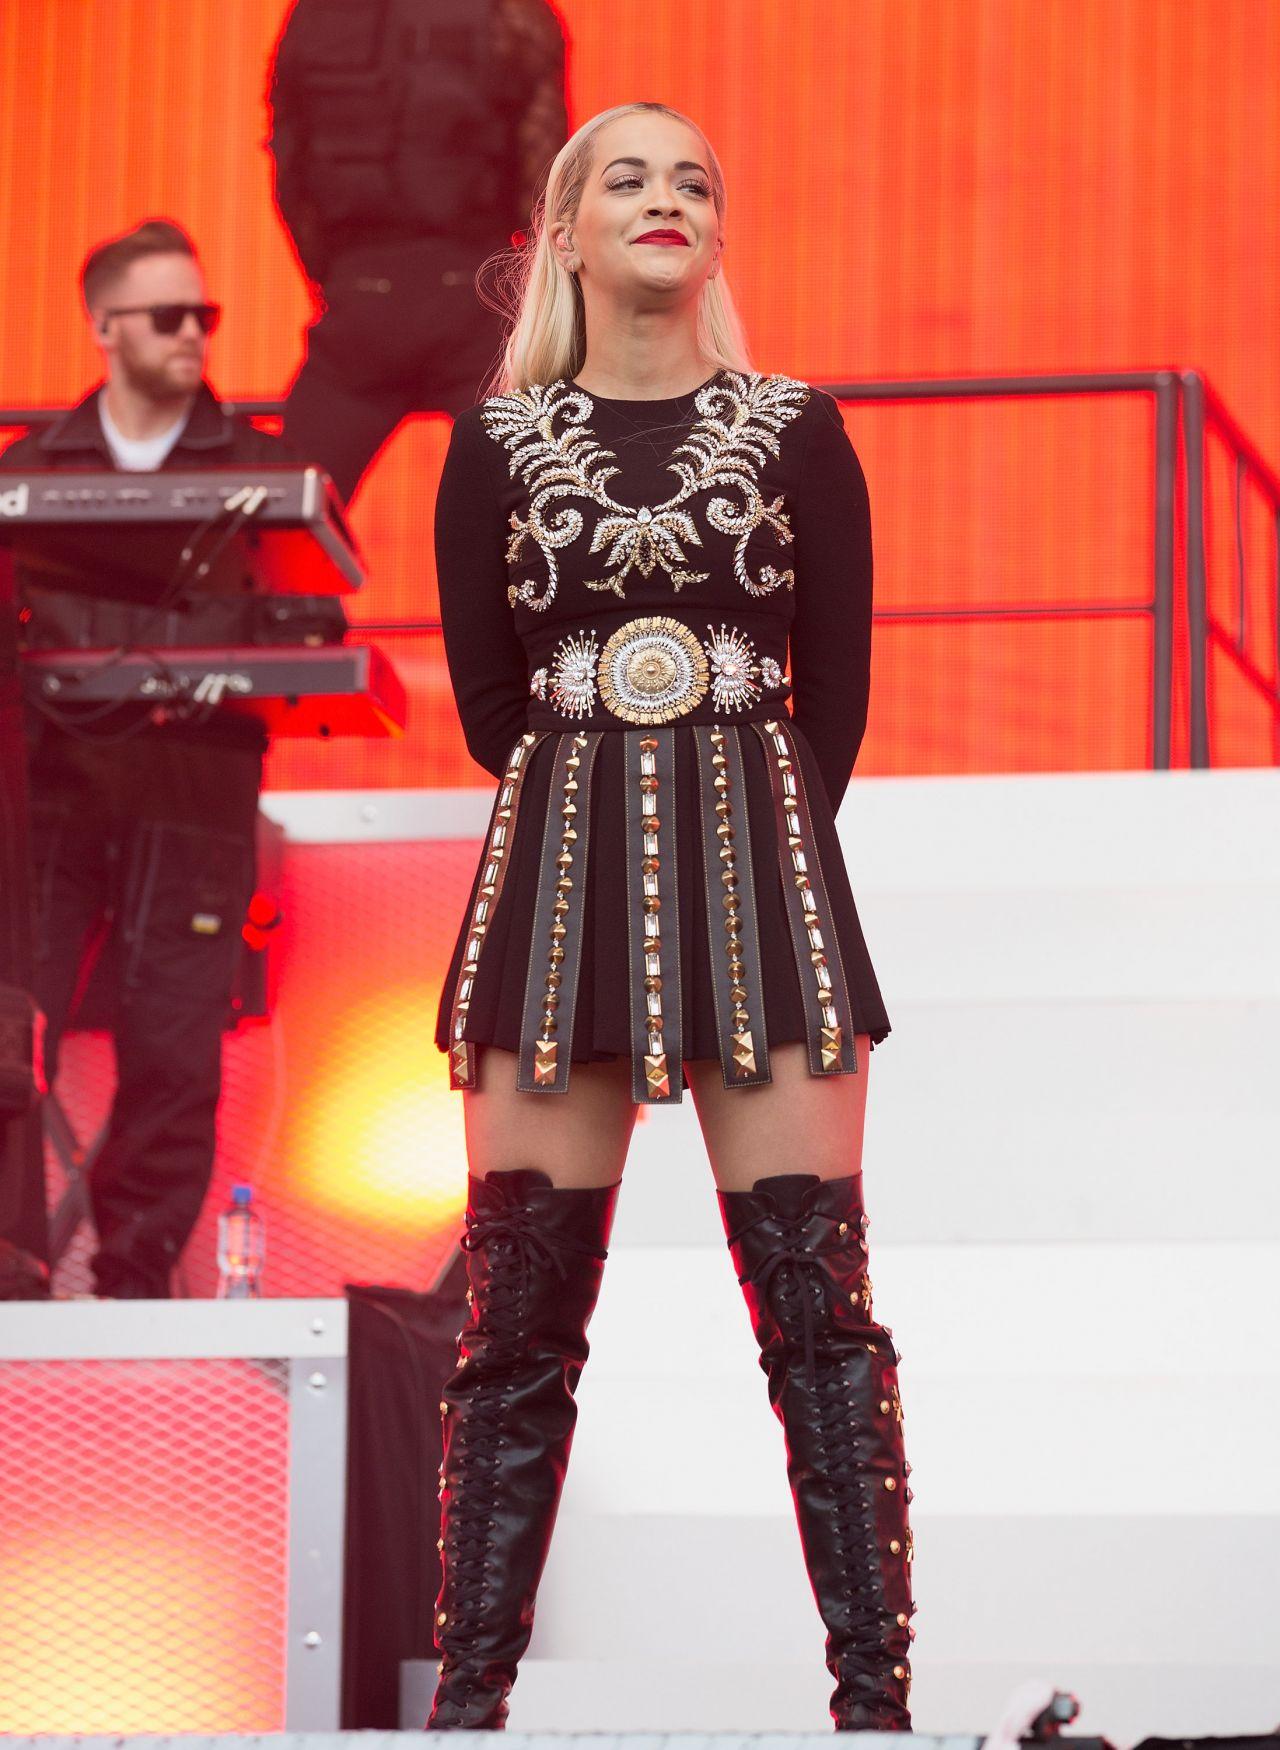 Rita Ora Performs at BBC Radio 1's Big Weekend 2015, Day 2 ...